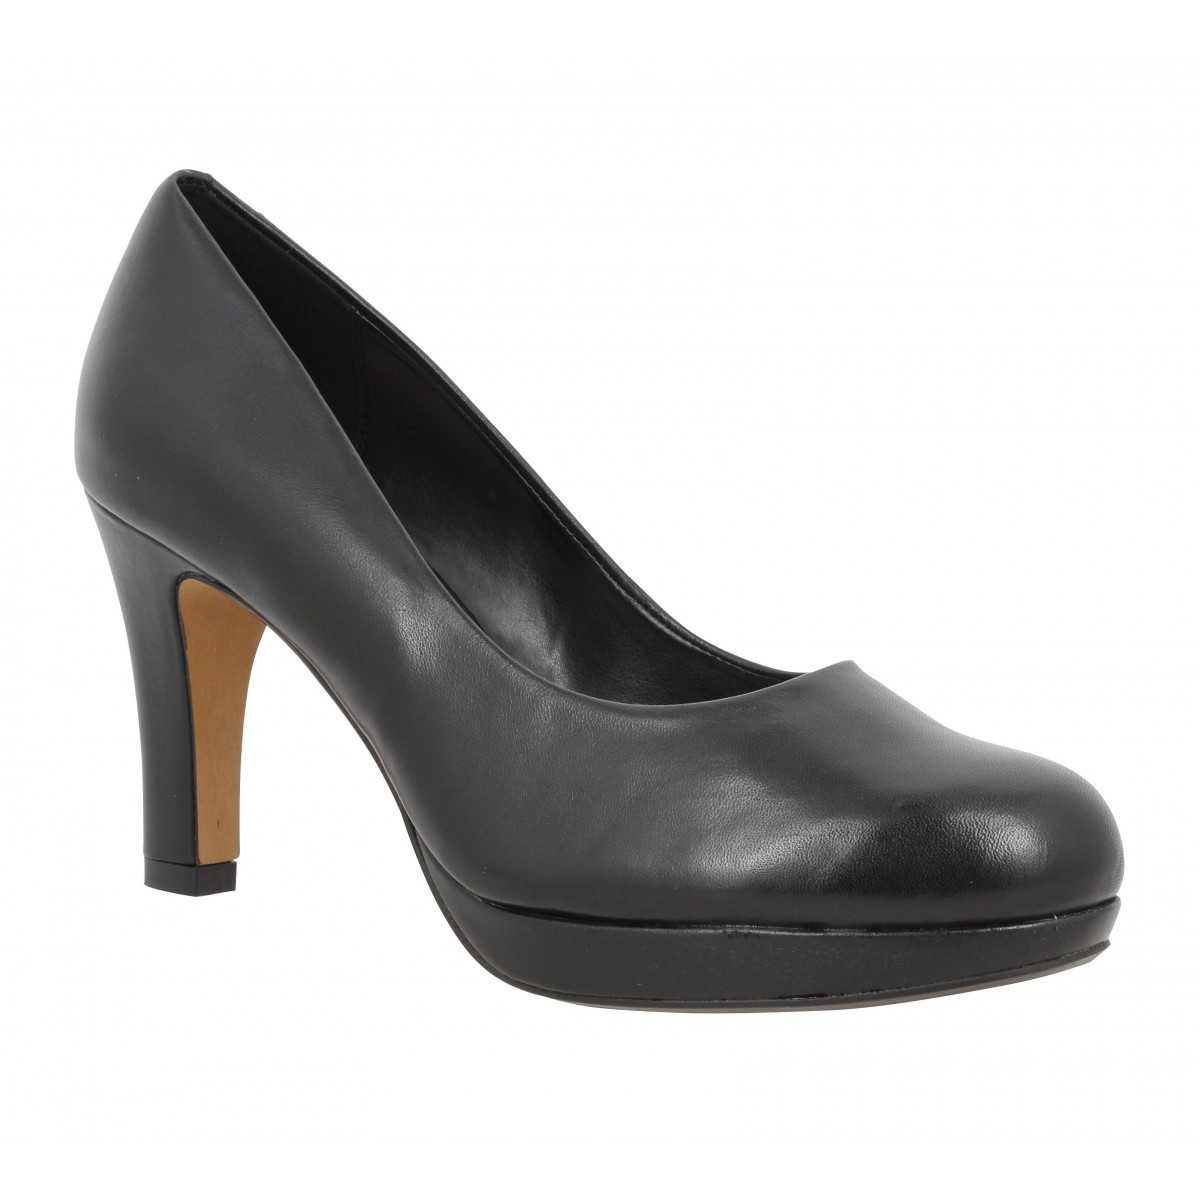 Escarpins CLARKS Crisp Kendra cuir Femme Noir